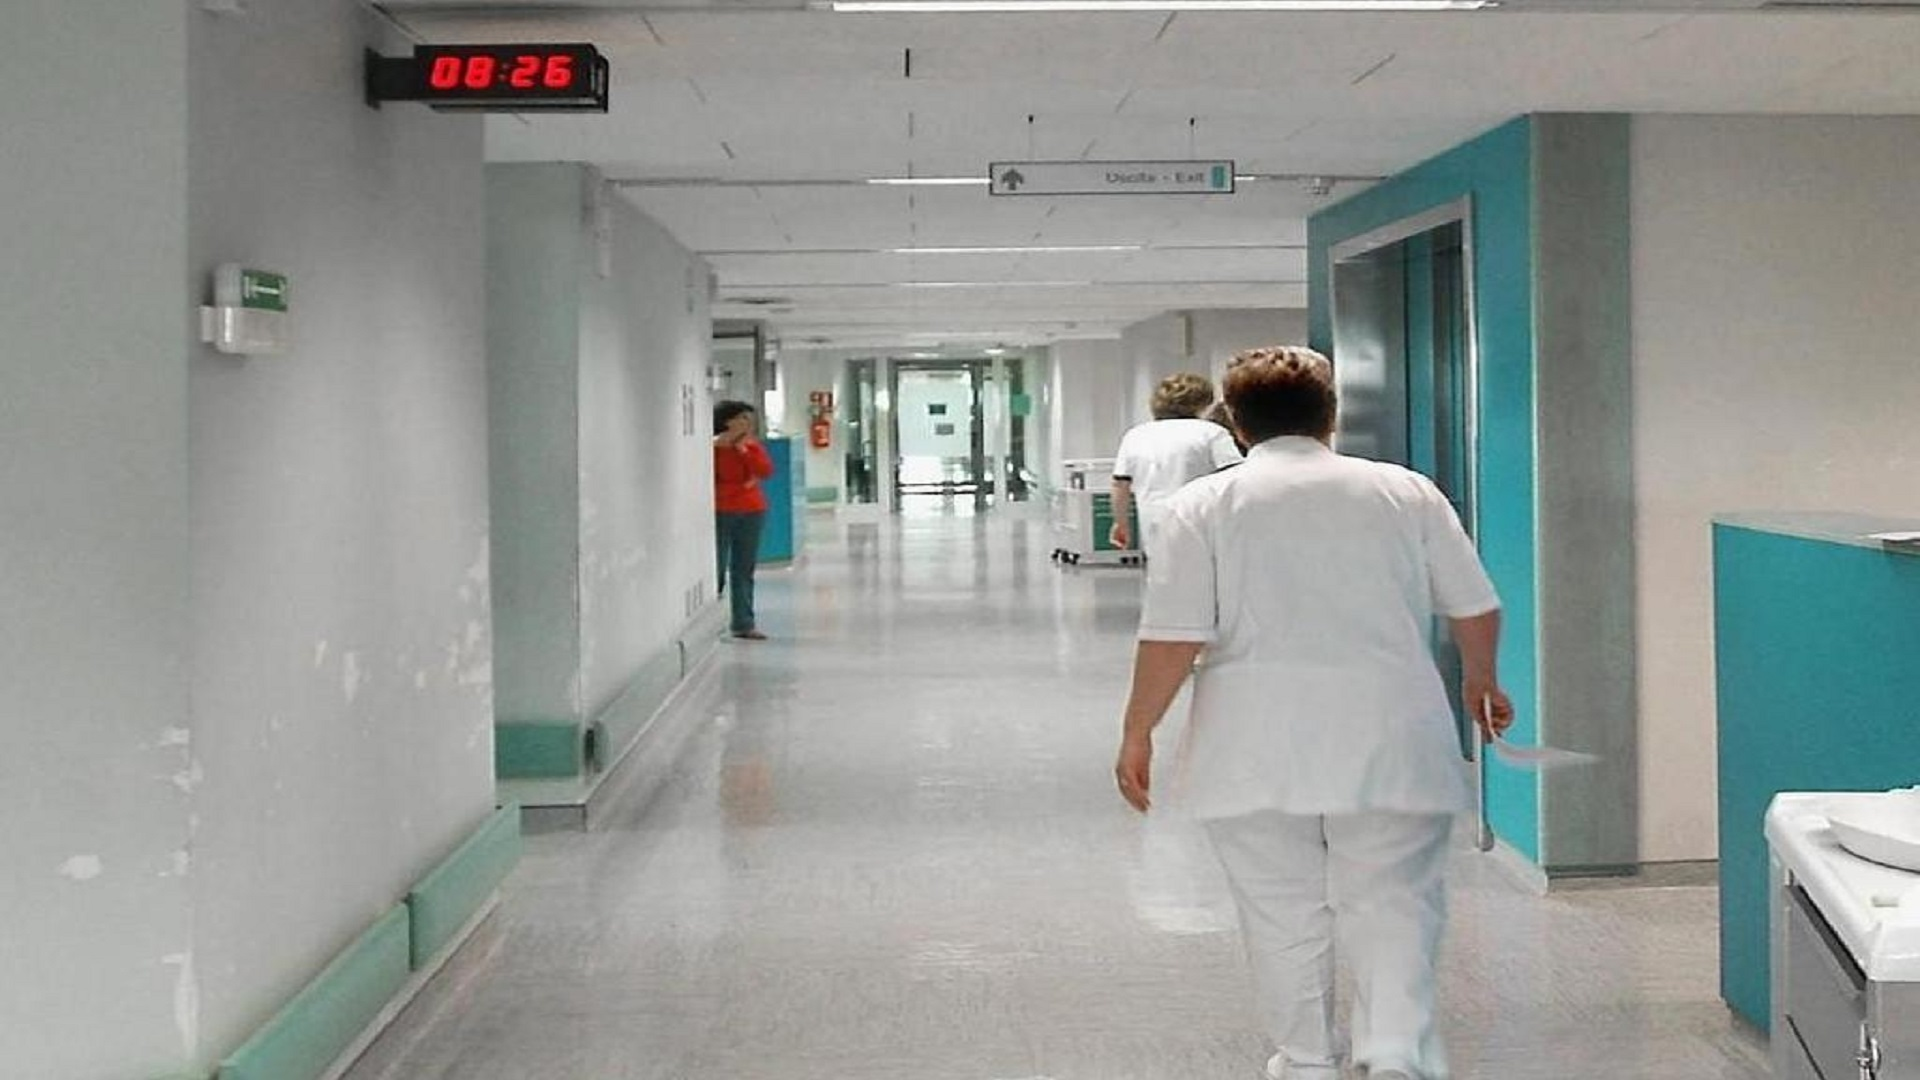 corridoio_ospedale-1024x768